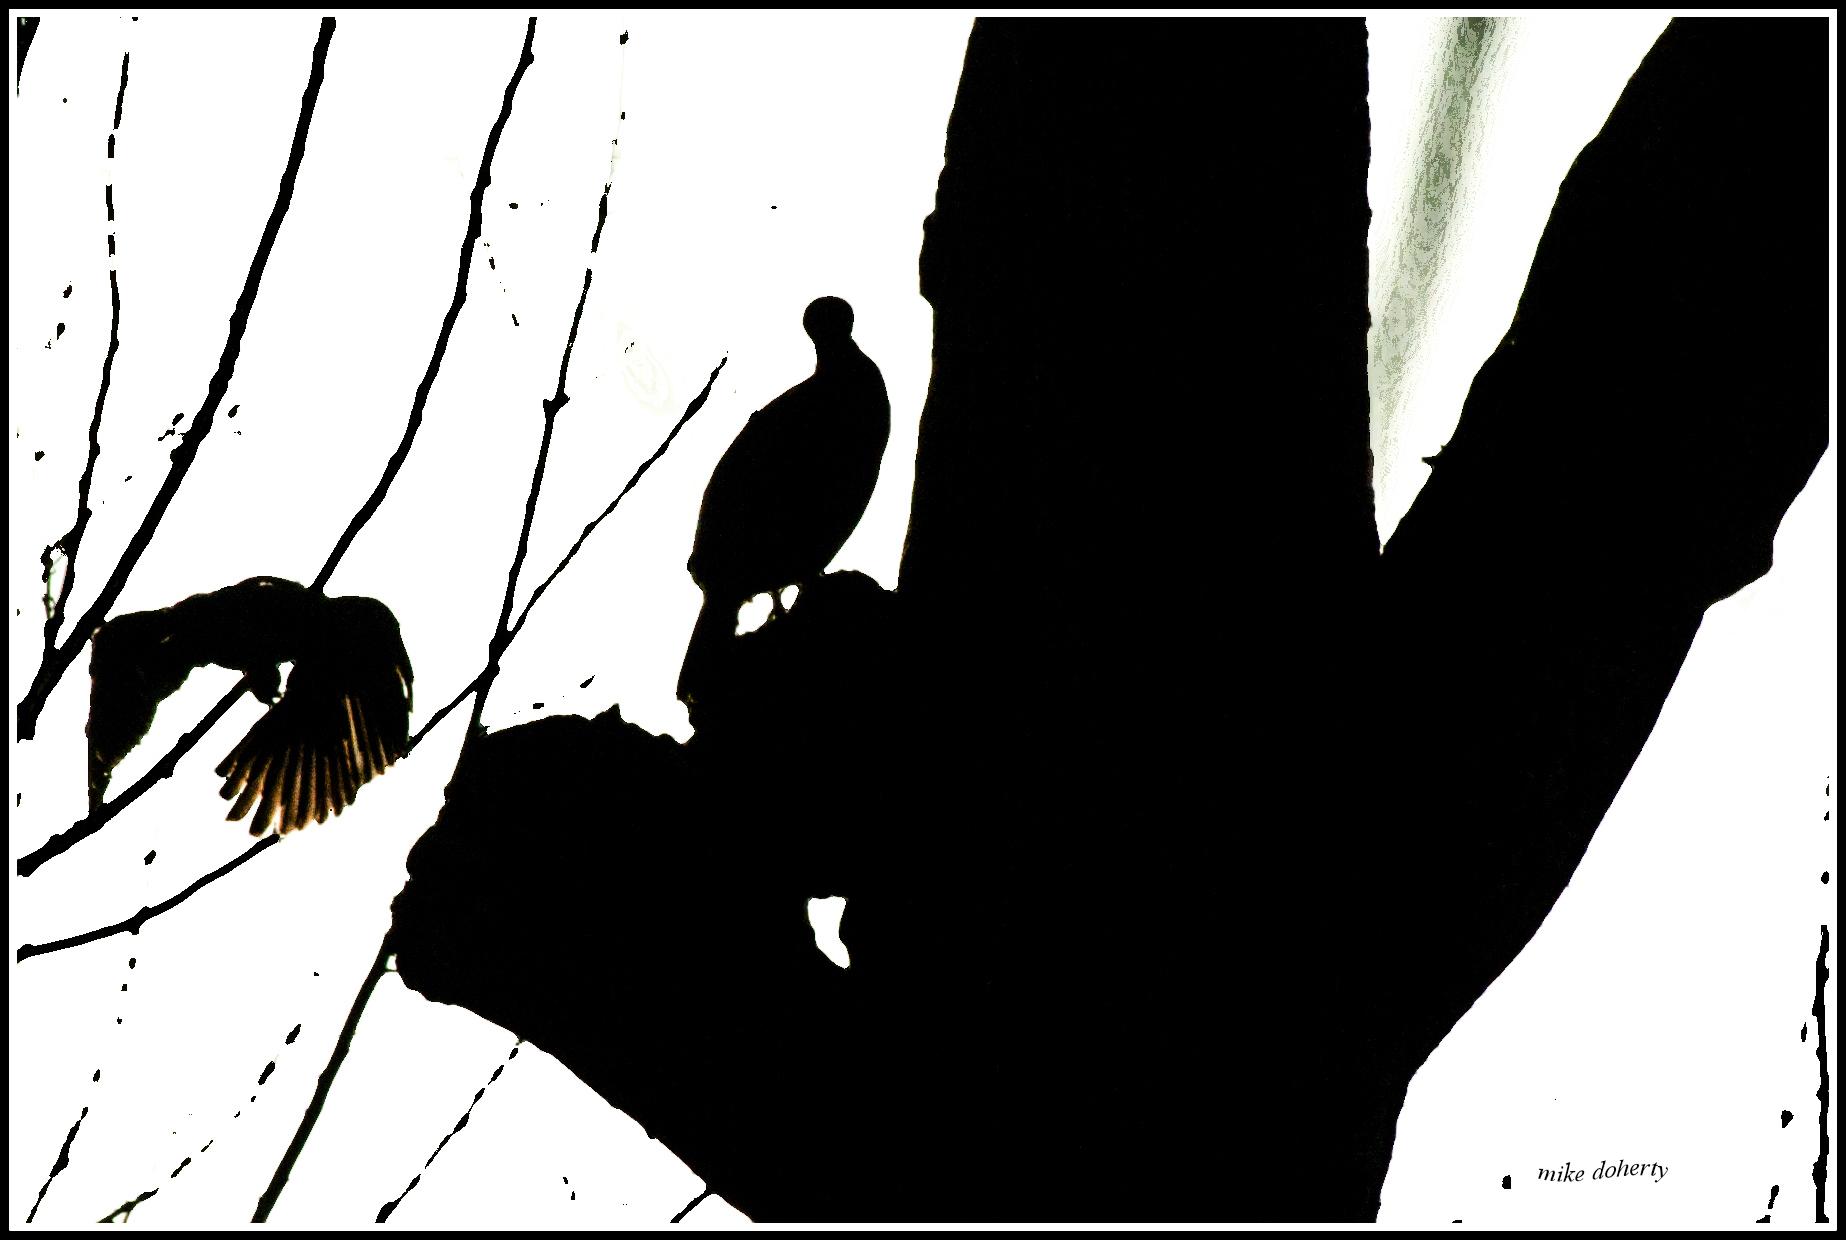 Branch telegraph. pic for poem